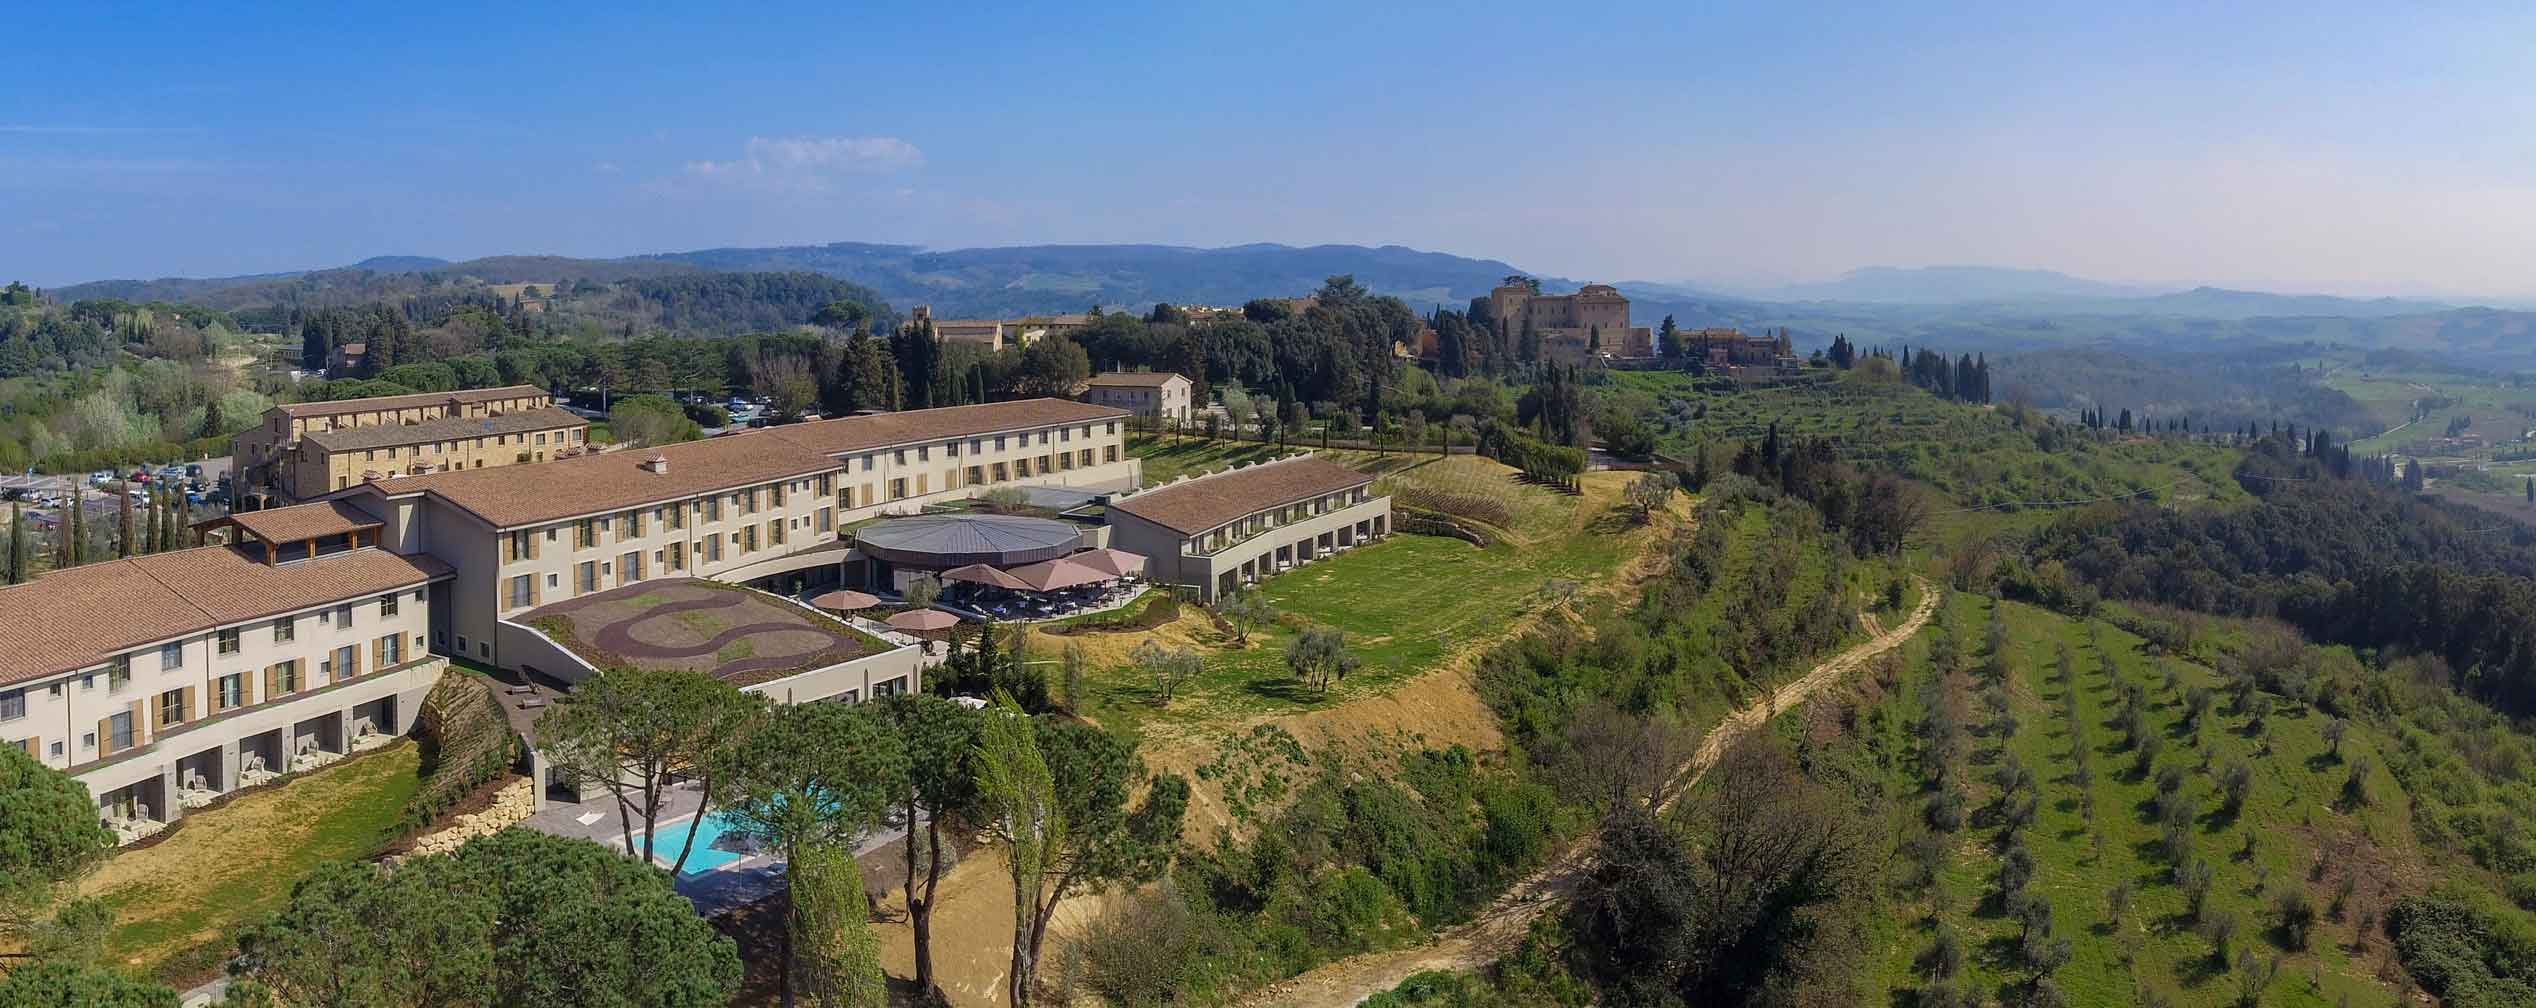 Panorama Il Castelfalfi Hotel Toskana